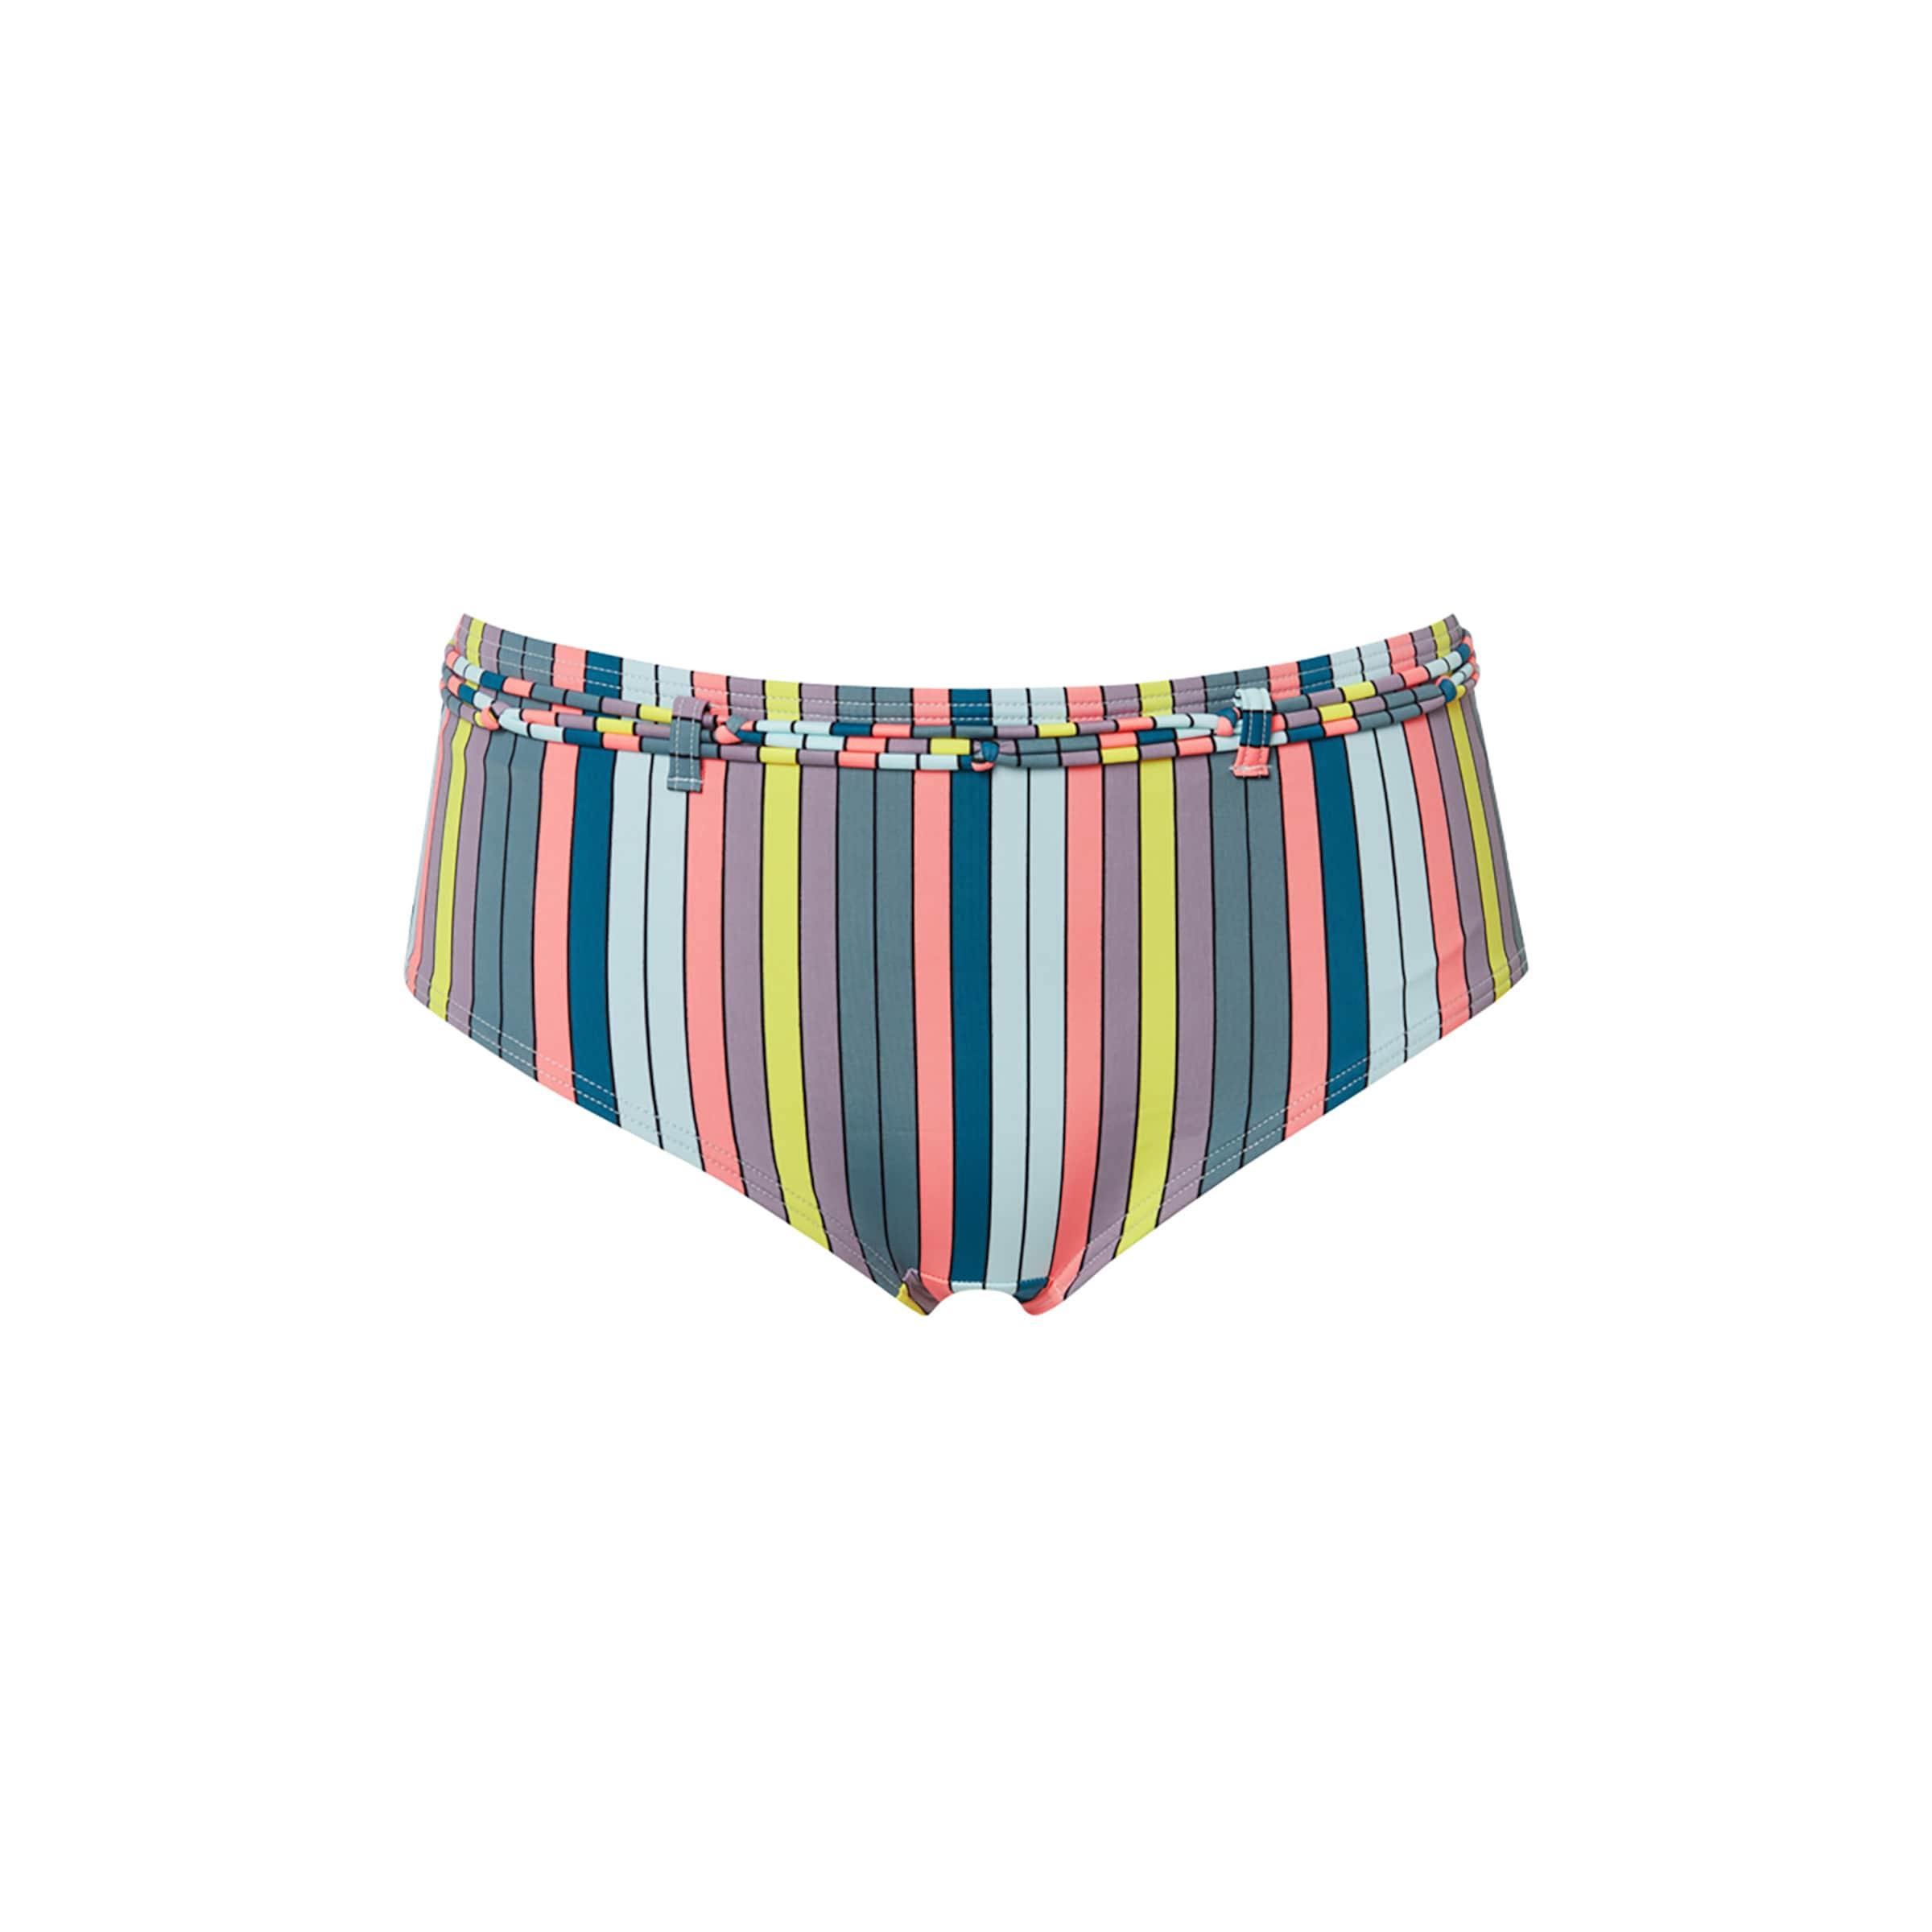 Altrosa 'palma Bottom' In O'neill Bikinihose Mix HellblauGrün Tl1Jc35FKu